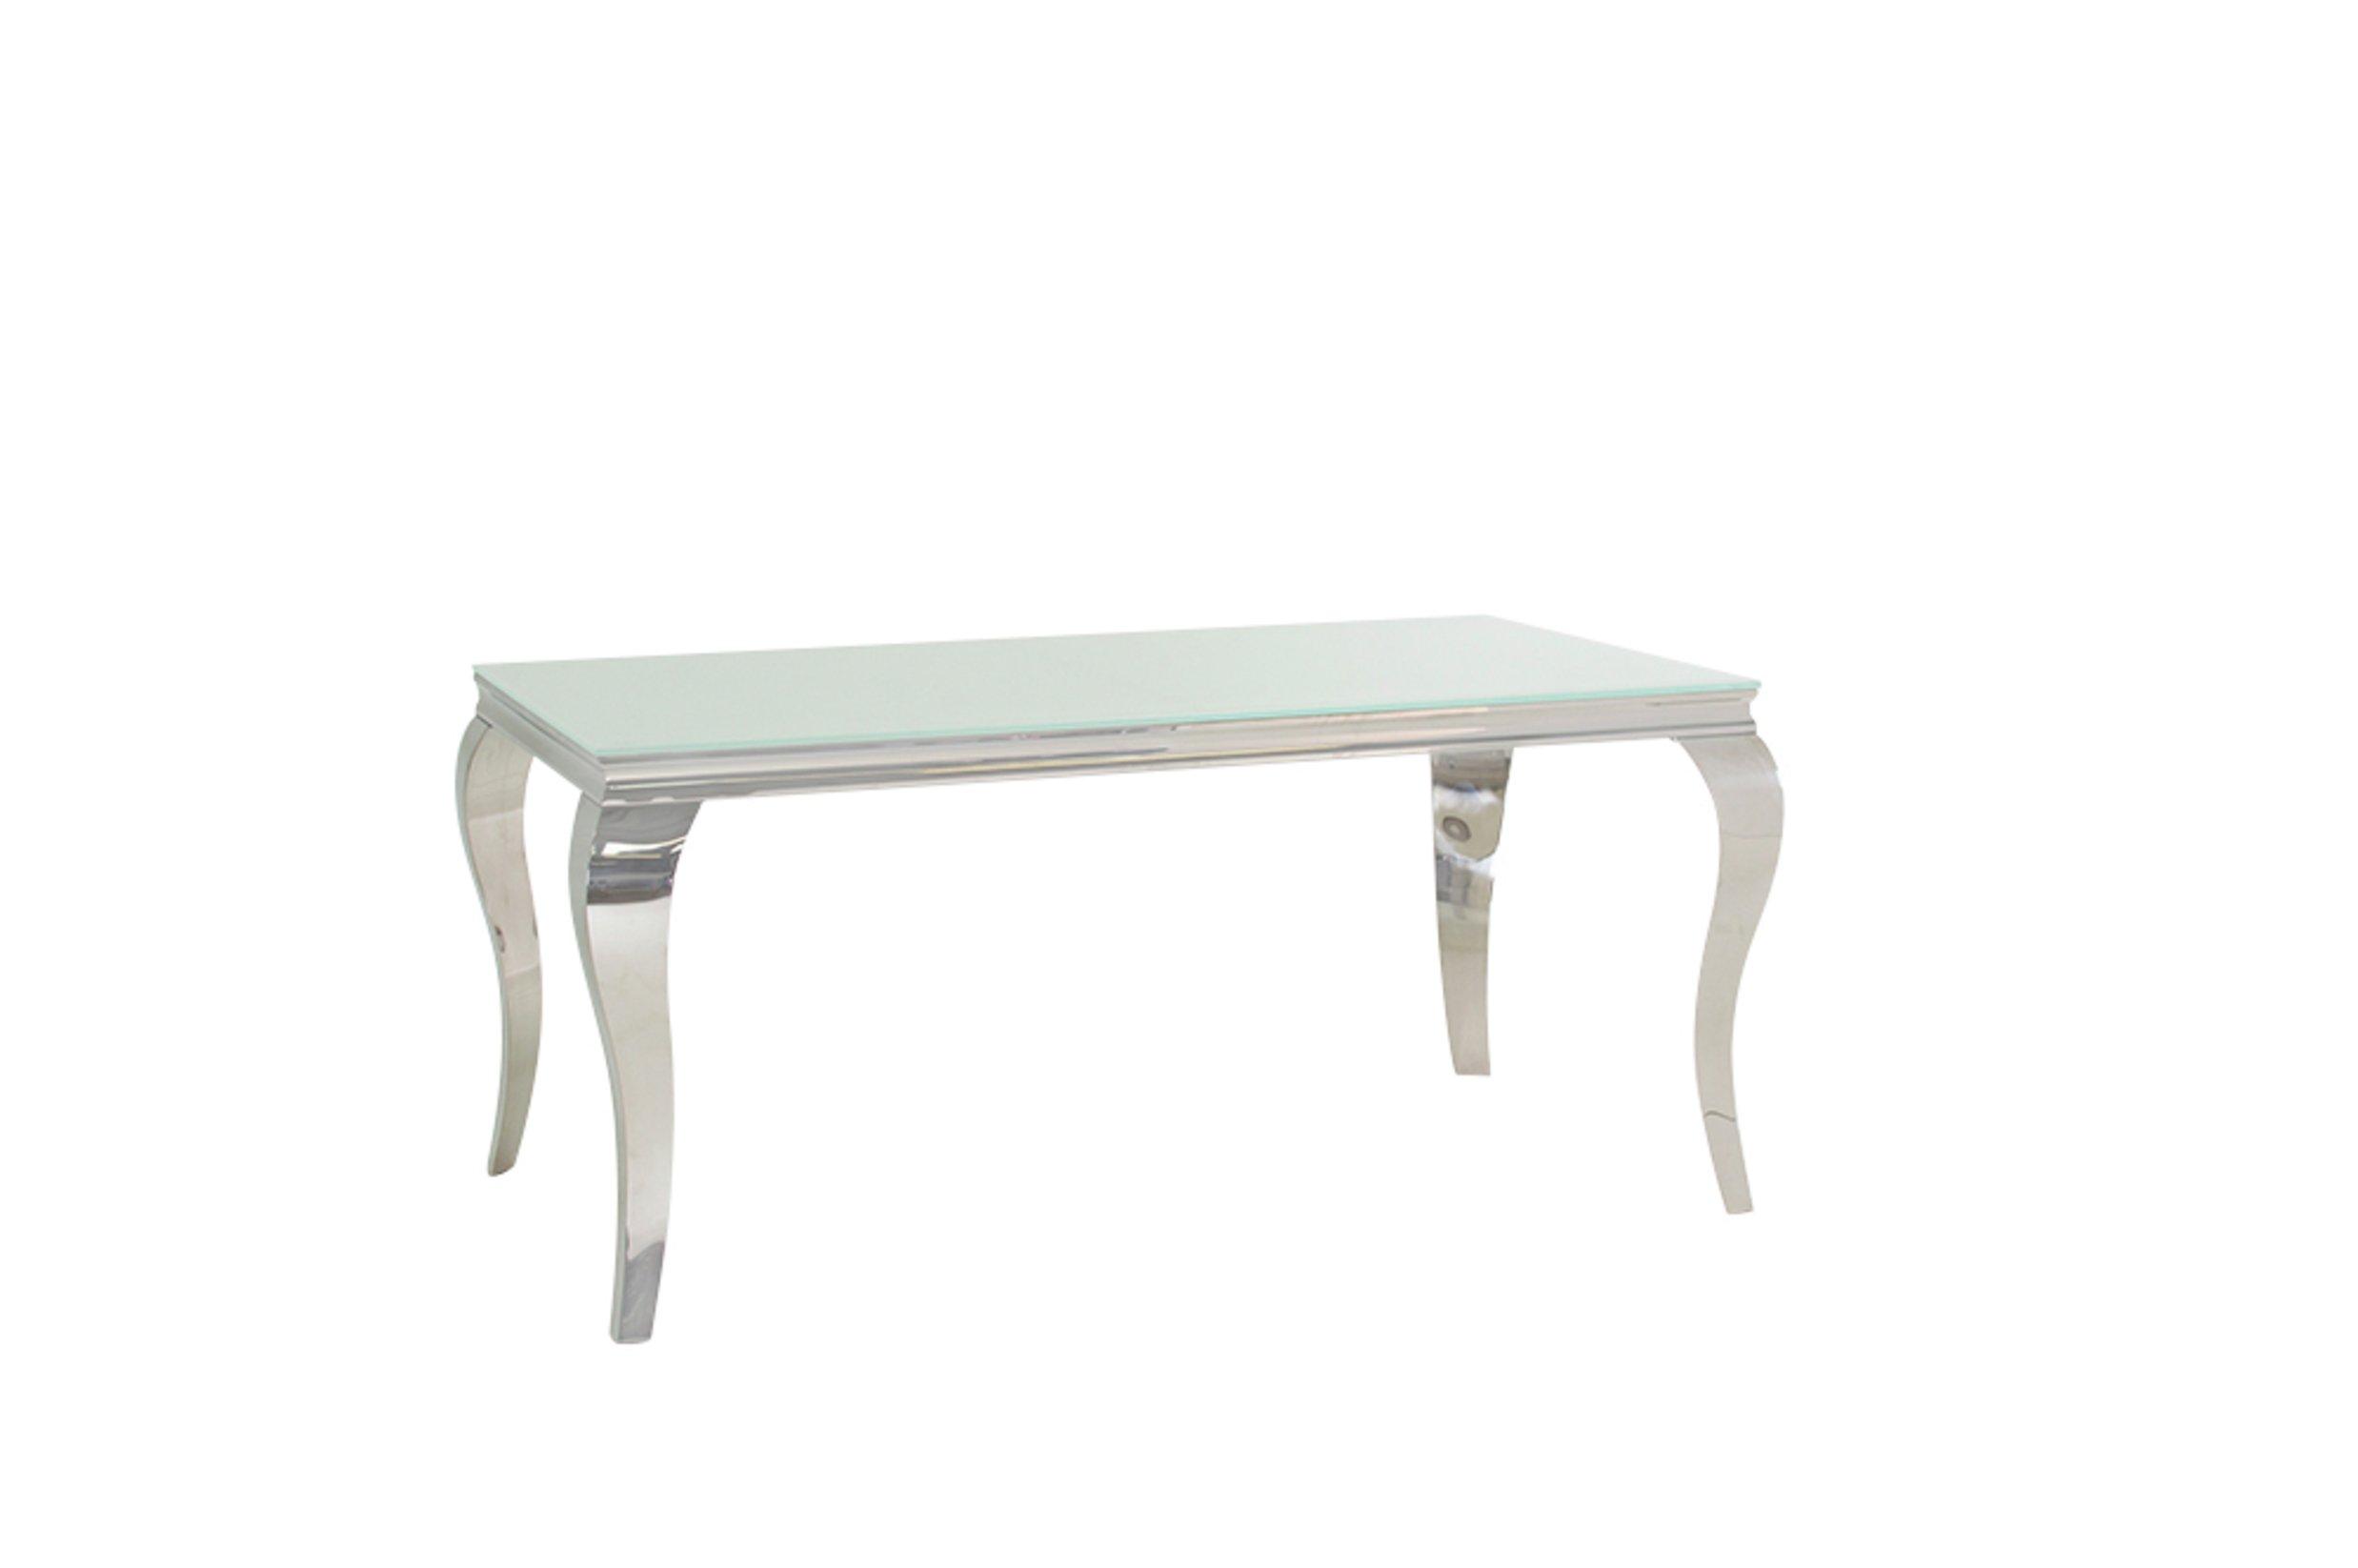 Image of Furnoko Louis Glass 4 Seater Table - White